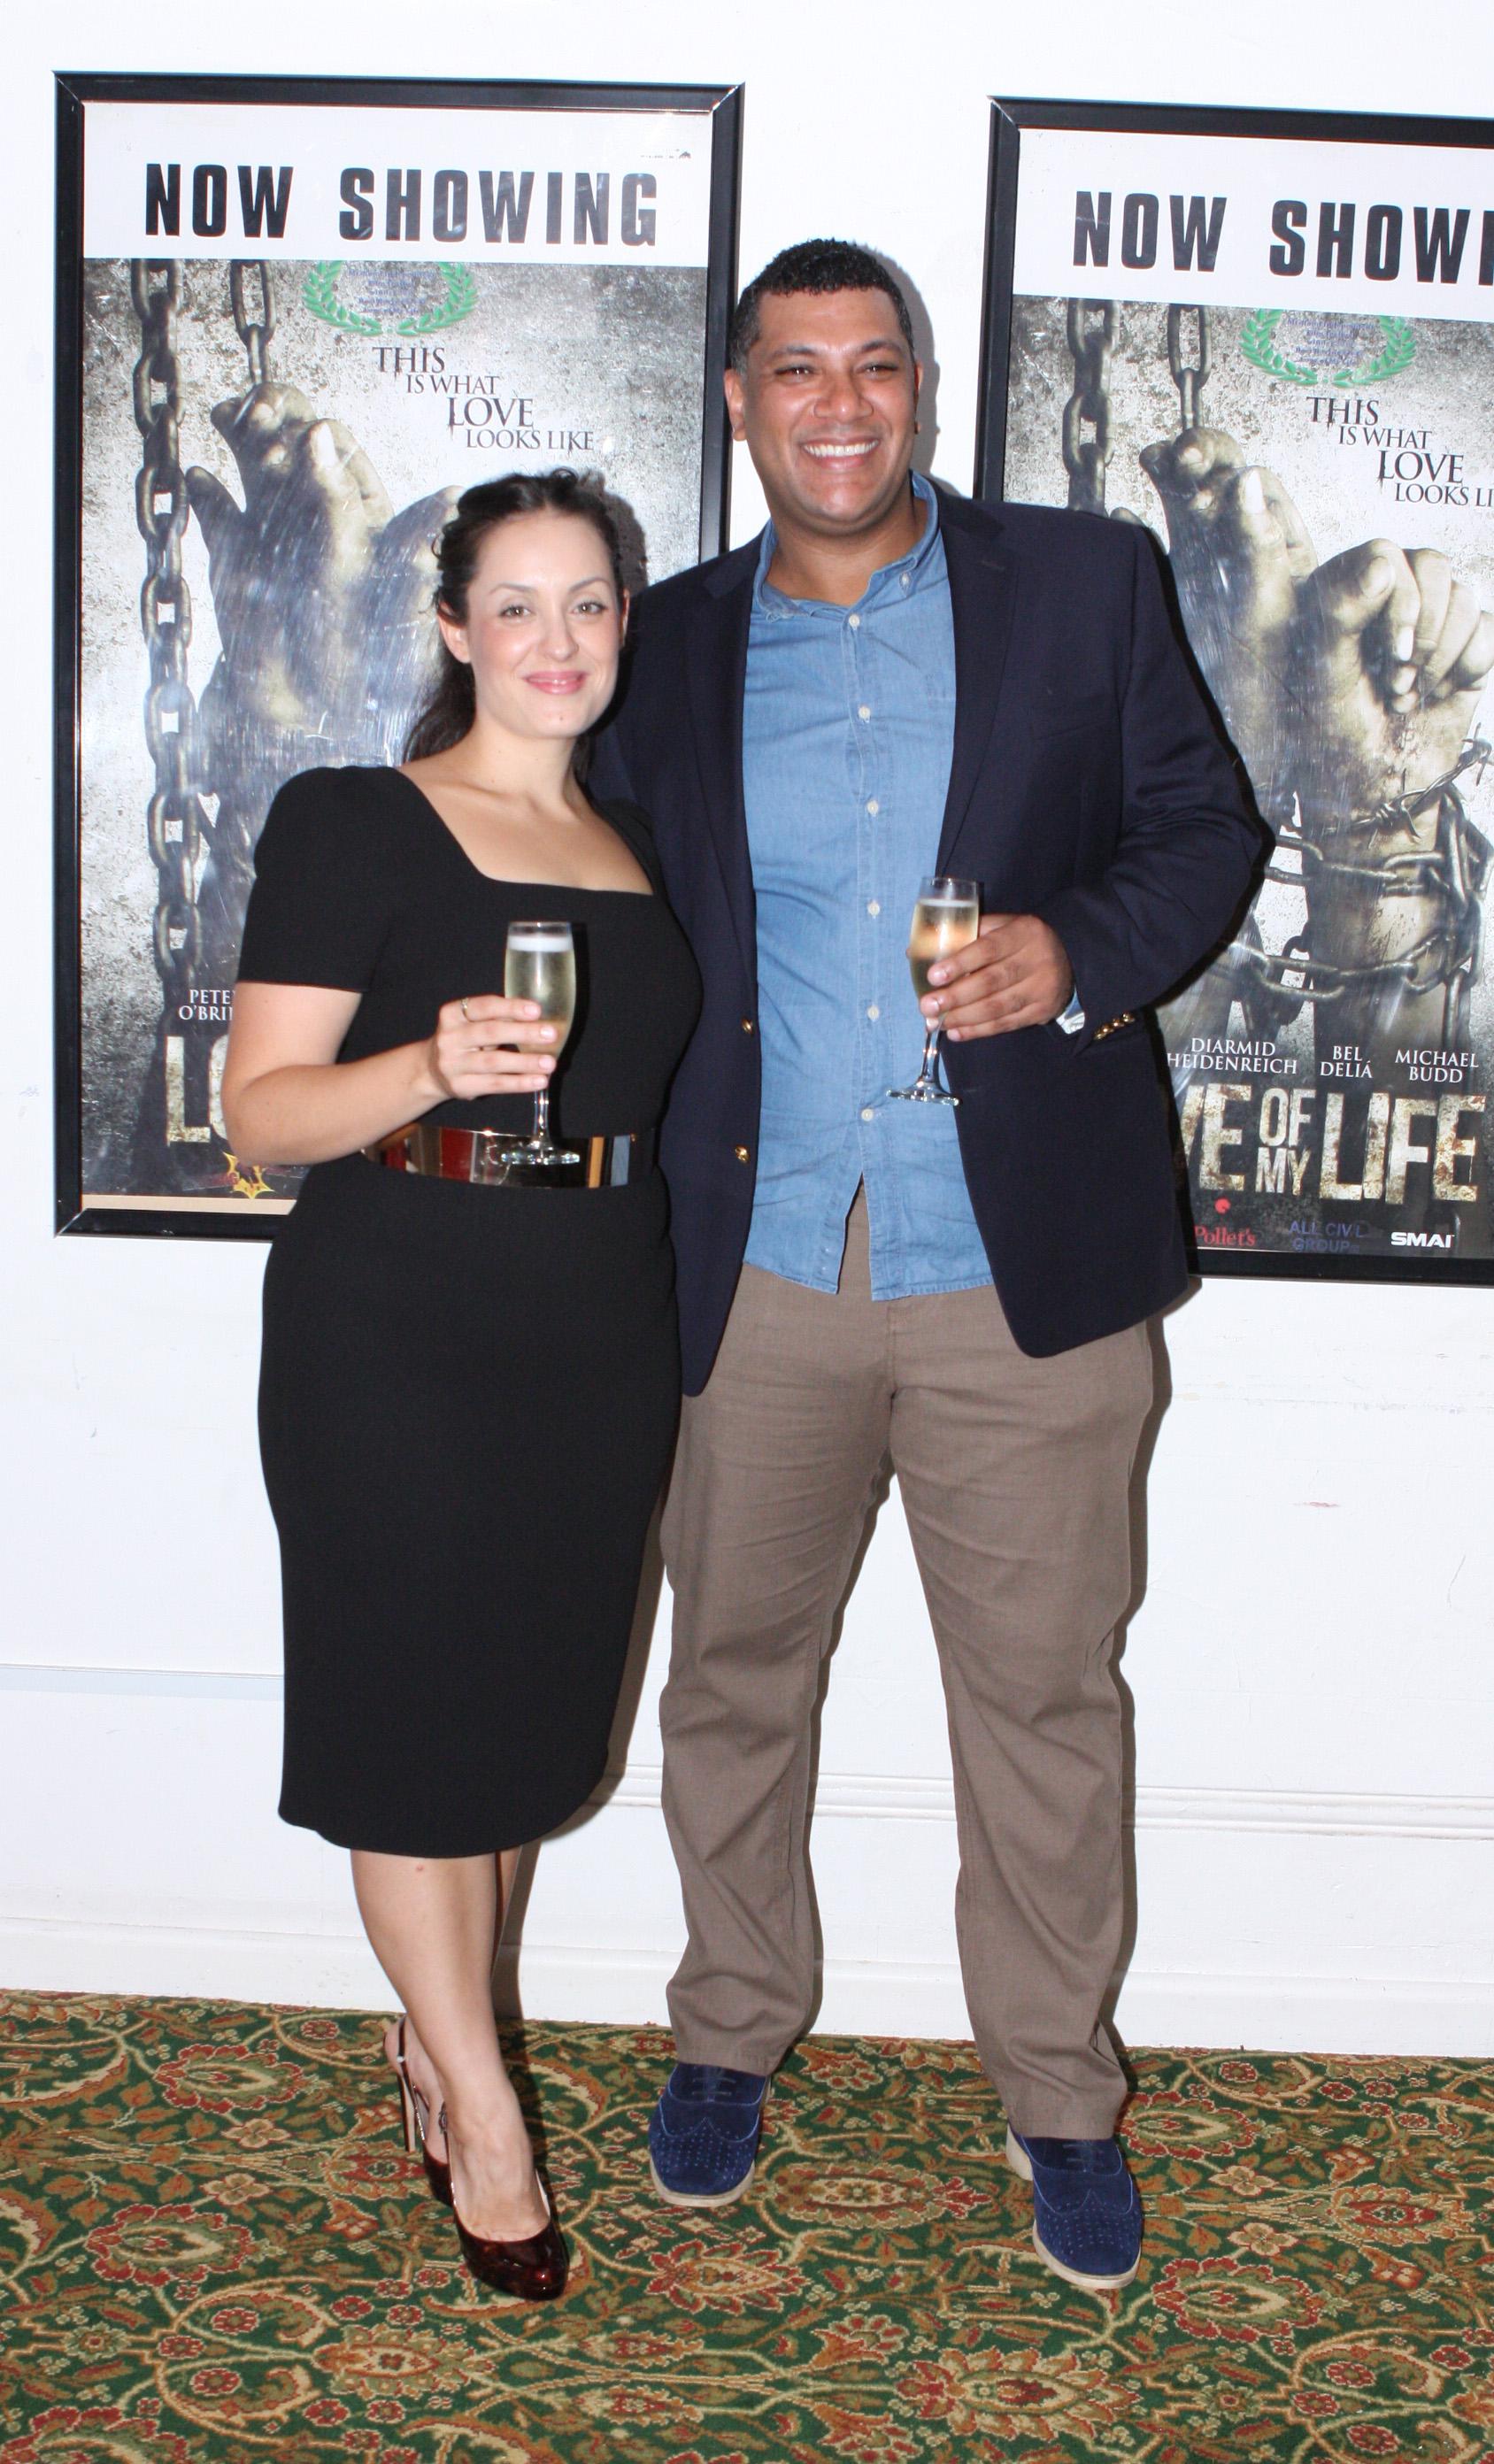 Michael Budd & Allison Berger @ premiere